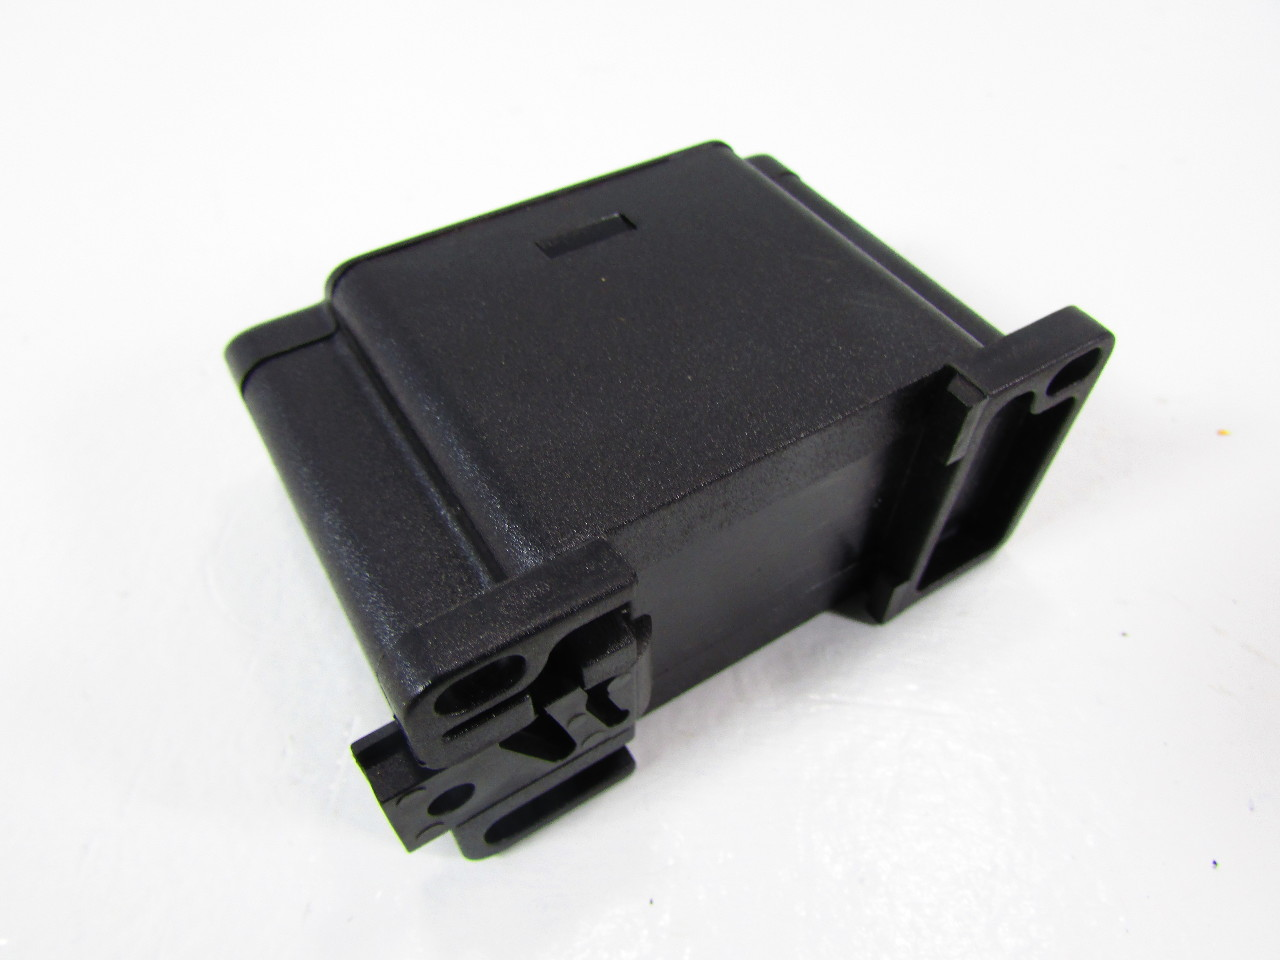 Moottorisuojain Msl115c Cranes Motor Thermal Protection Device Ebay